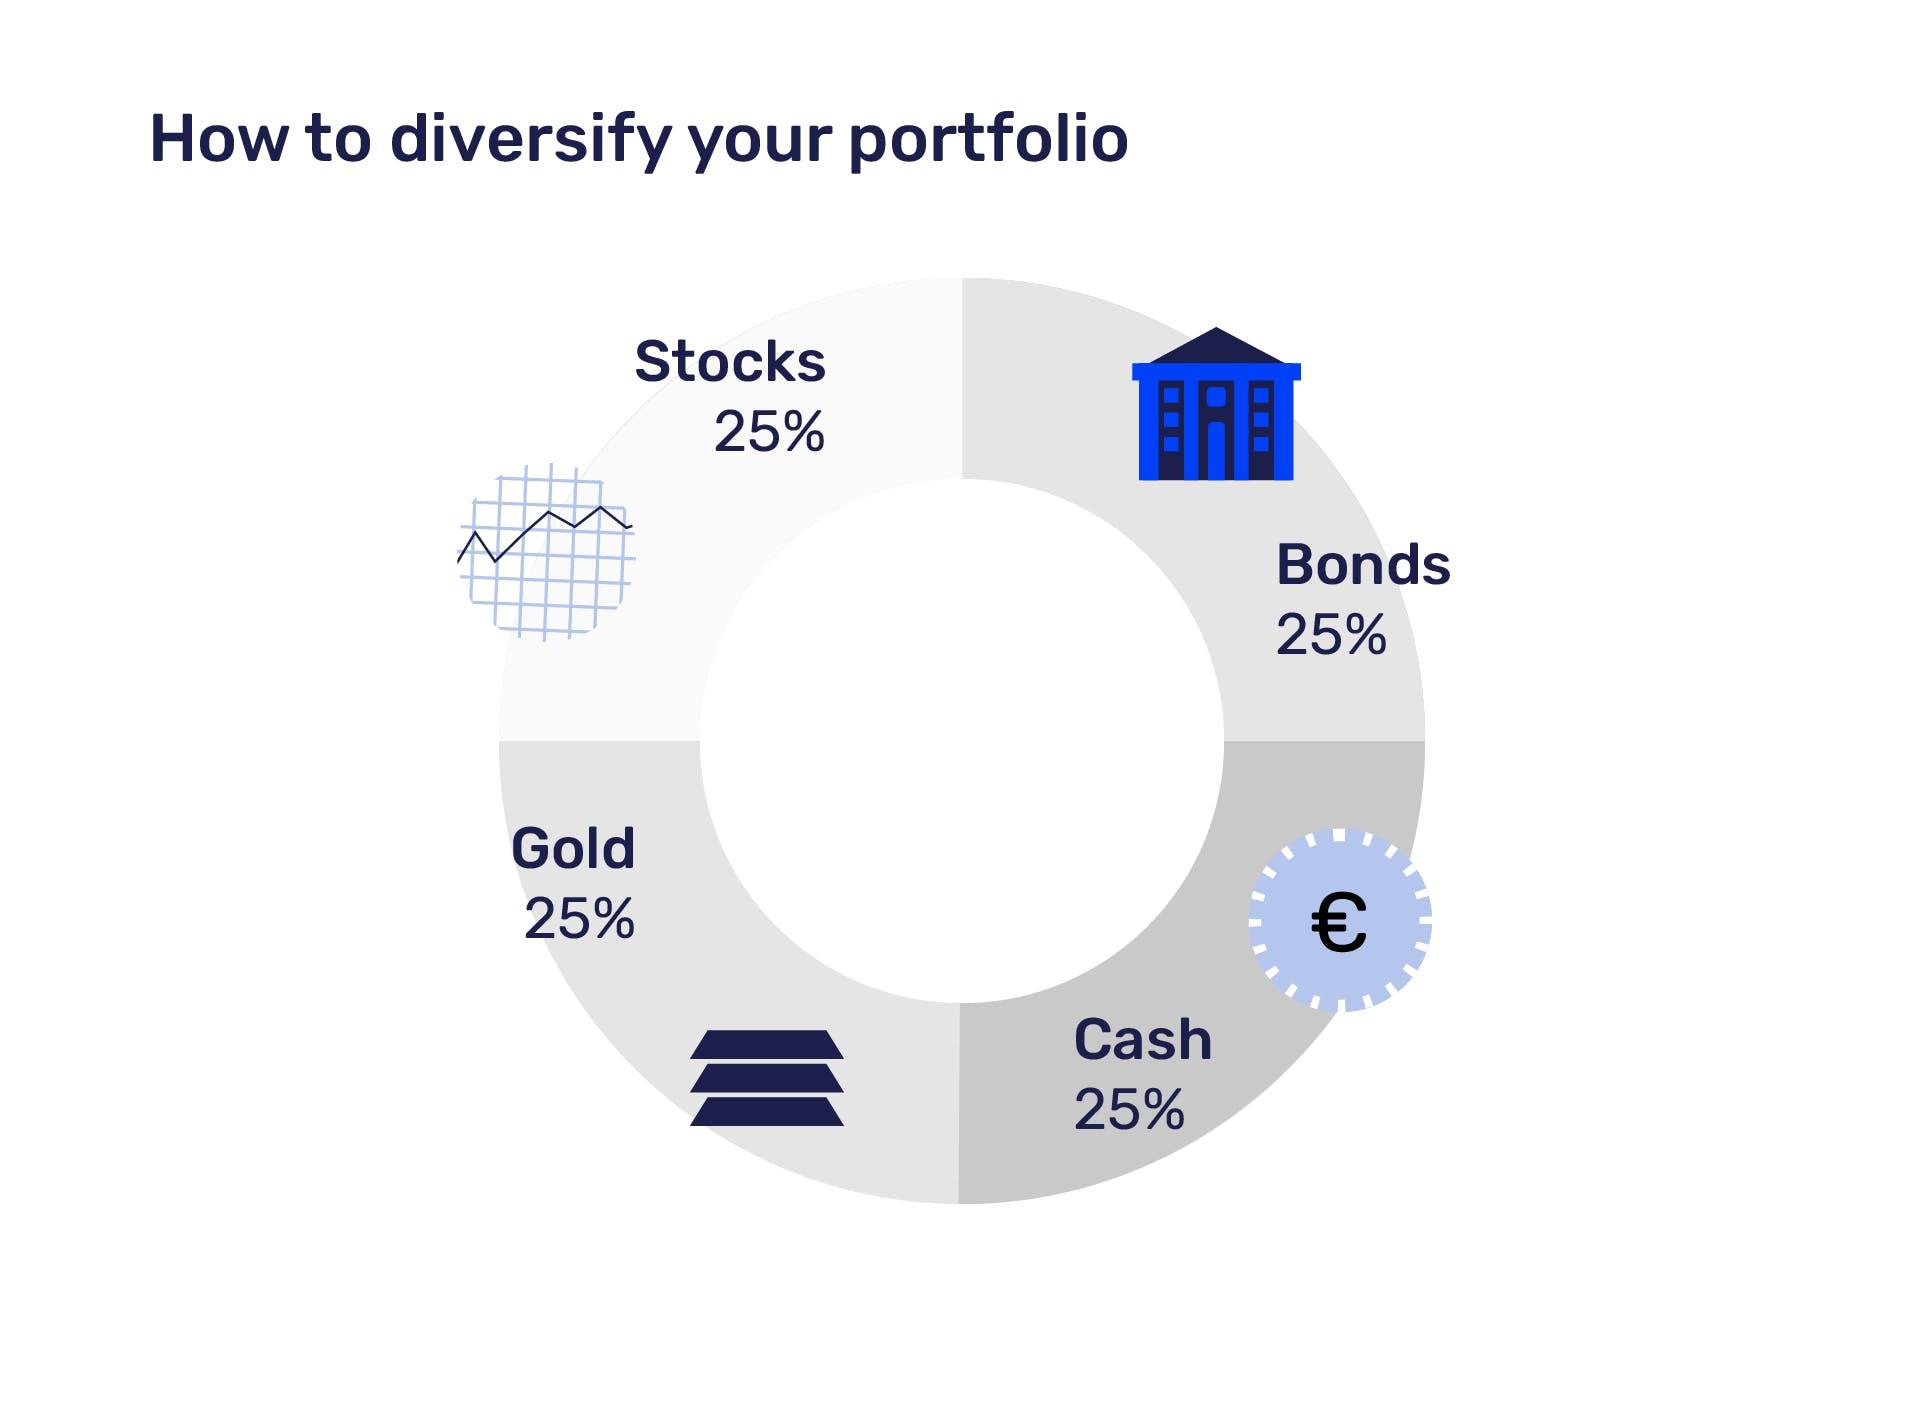 Well diversified portfolio example